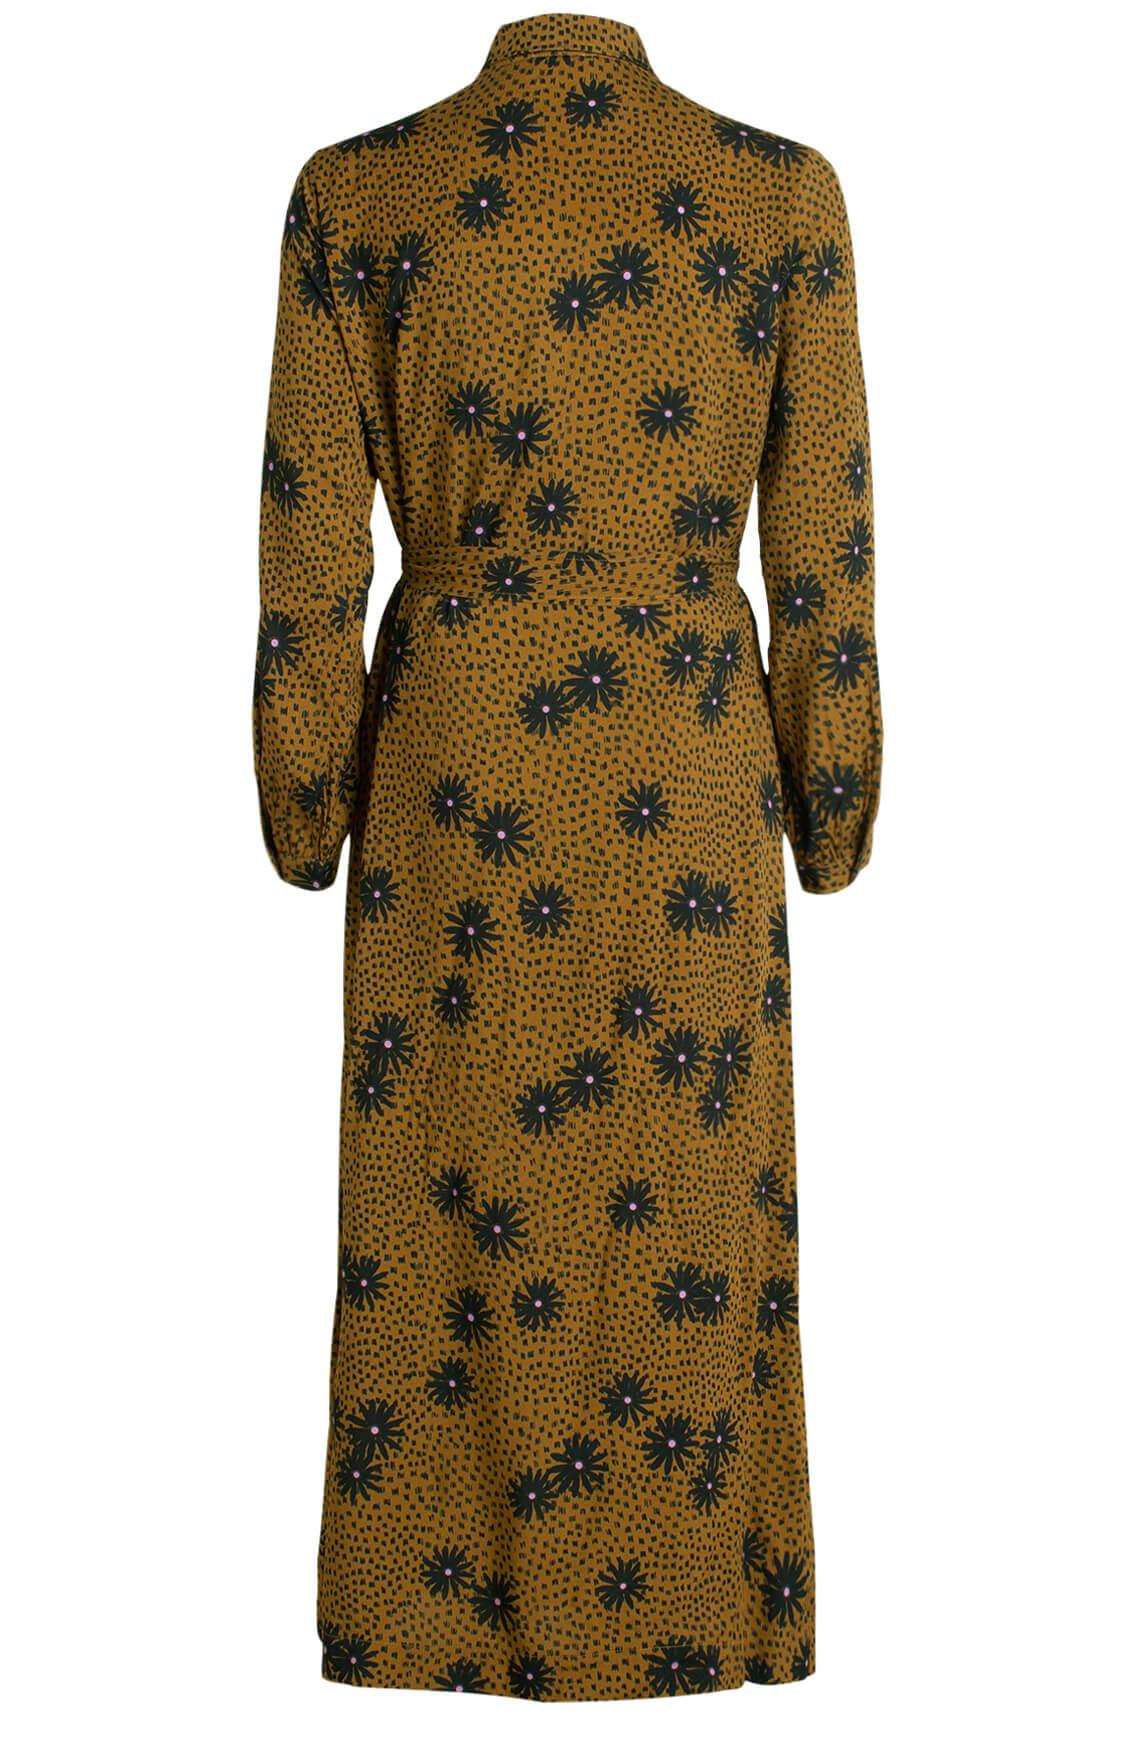 Anna Dames Lange jurk met bloemenprint groen